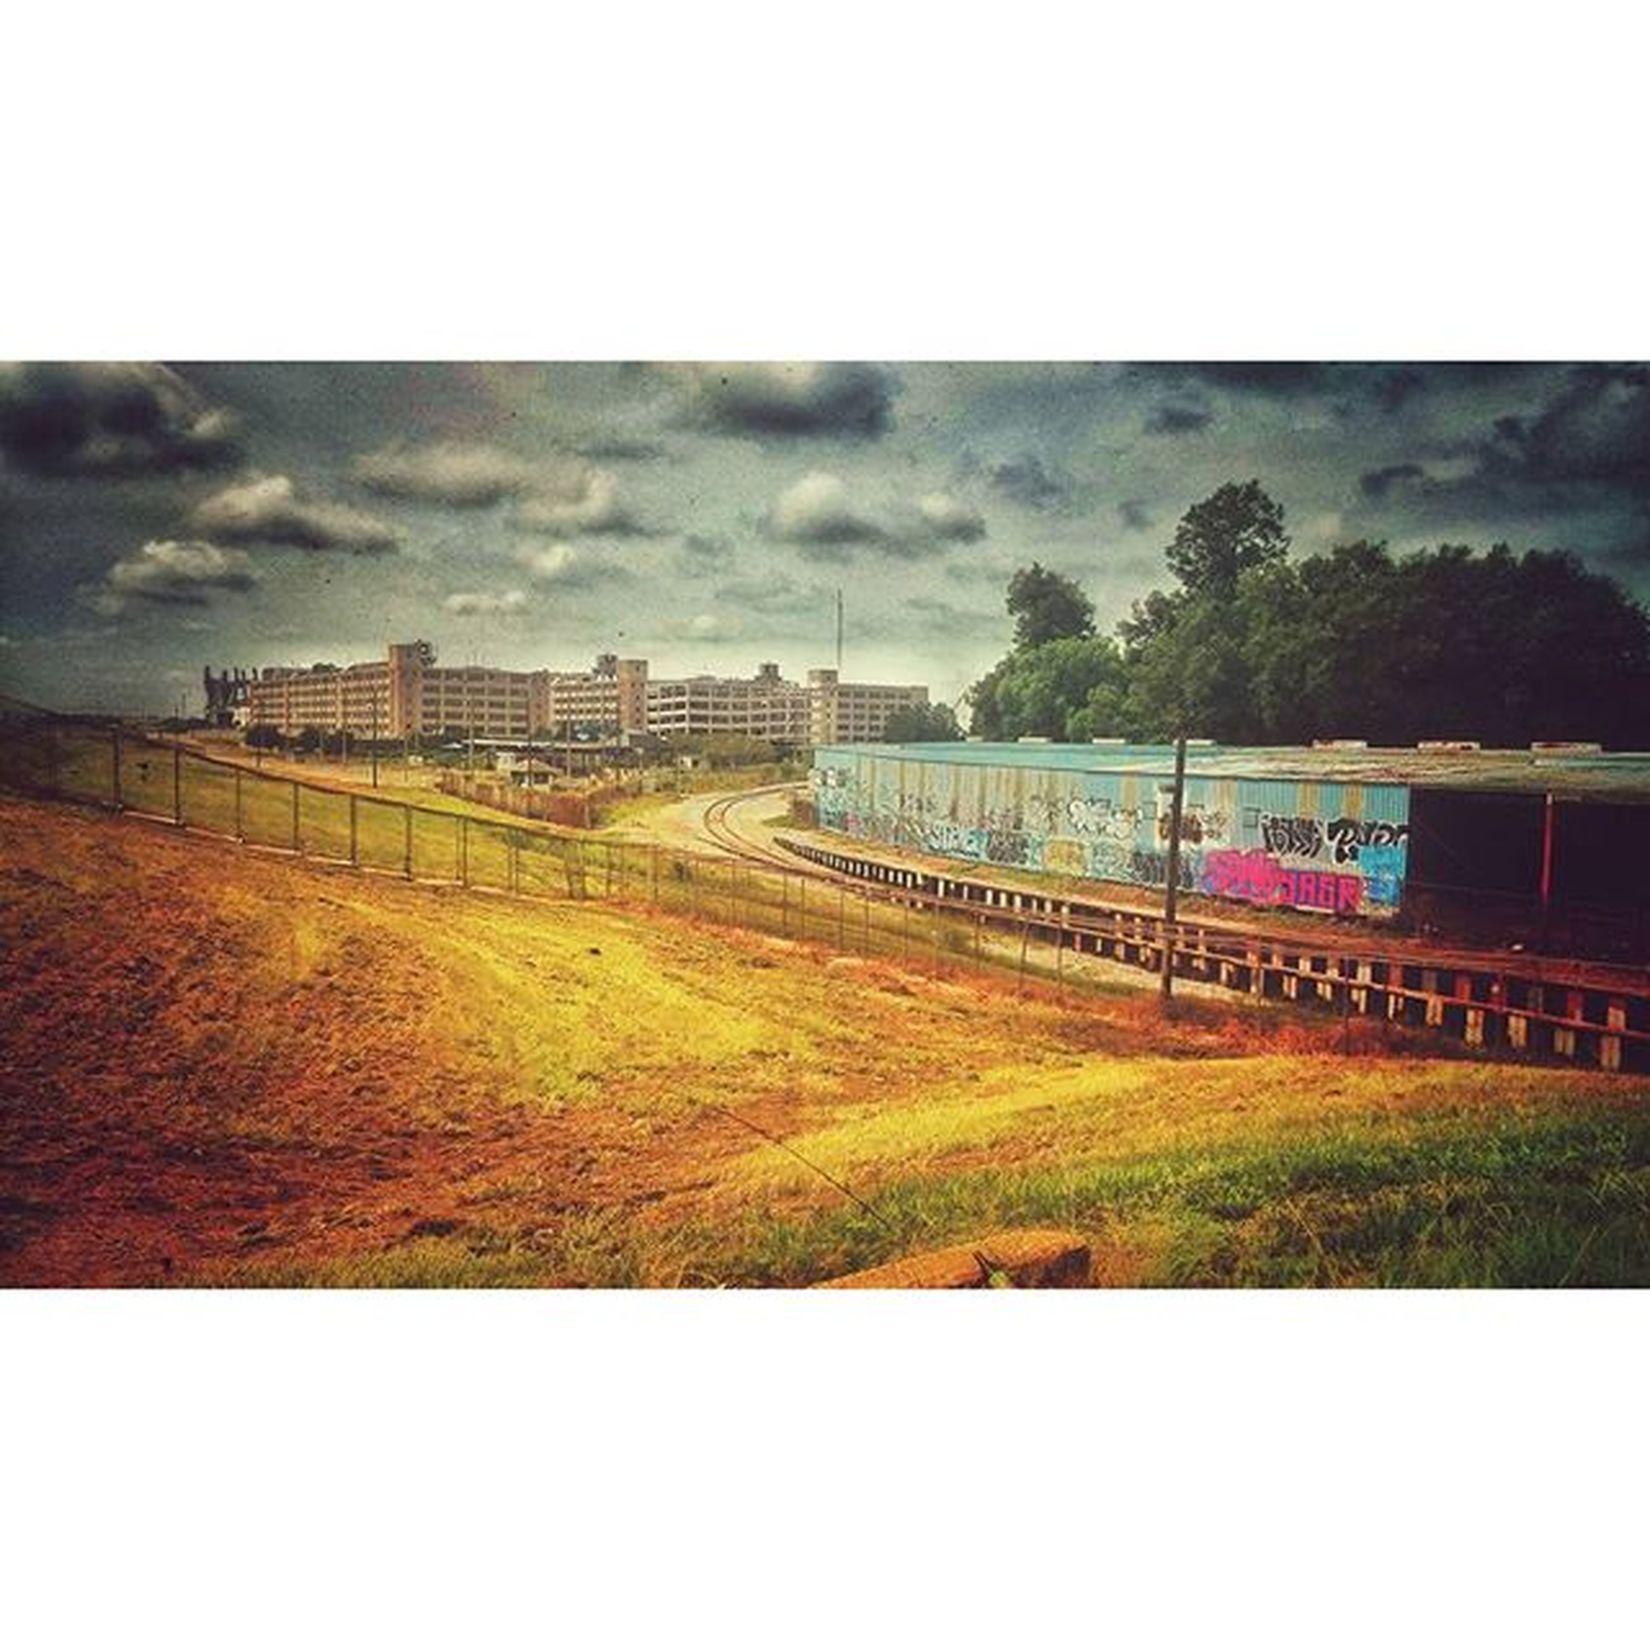 Neworleans Usnaval Graffiti Tracks clouds grass levy Louisiana nola